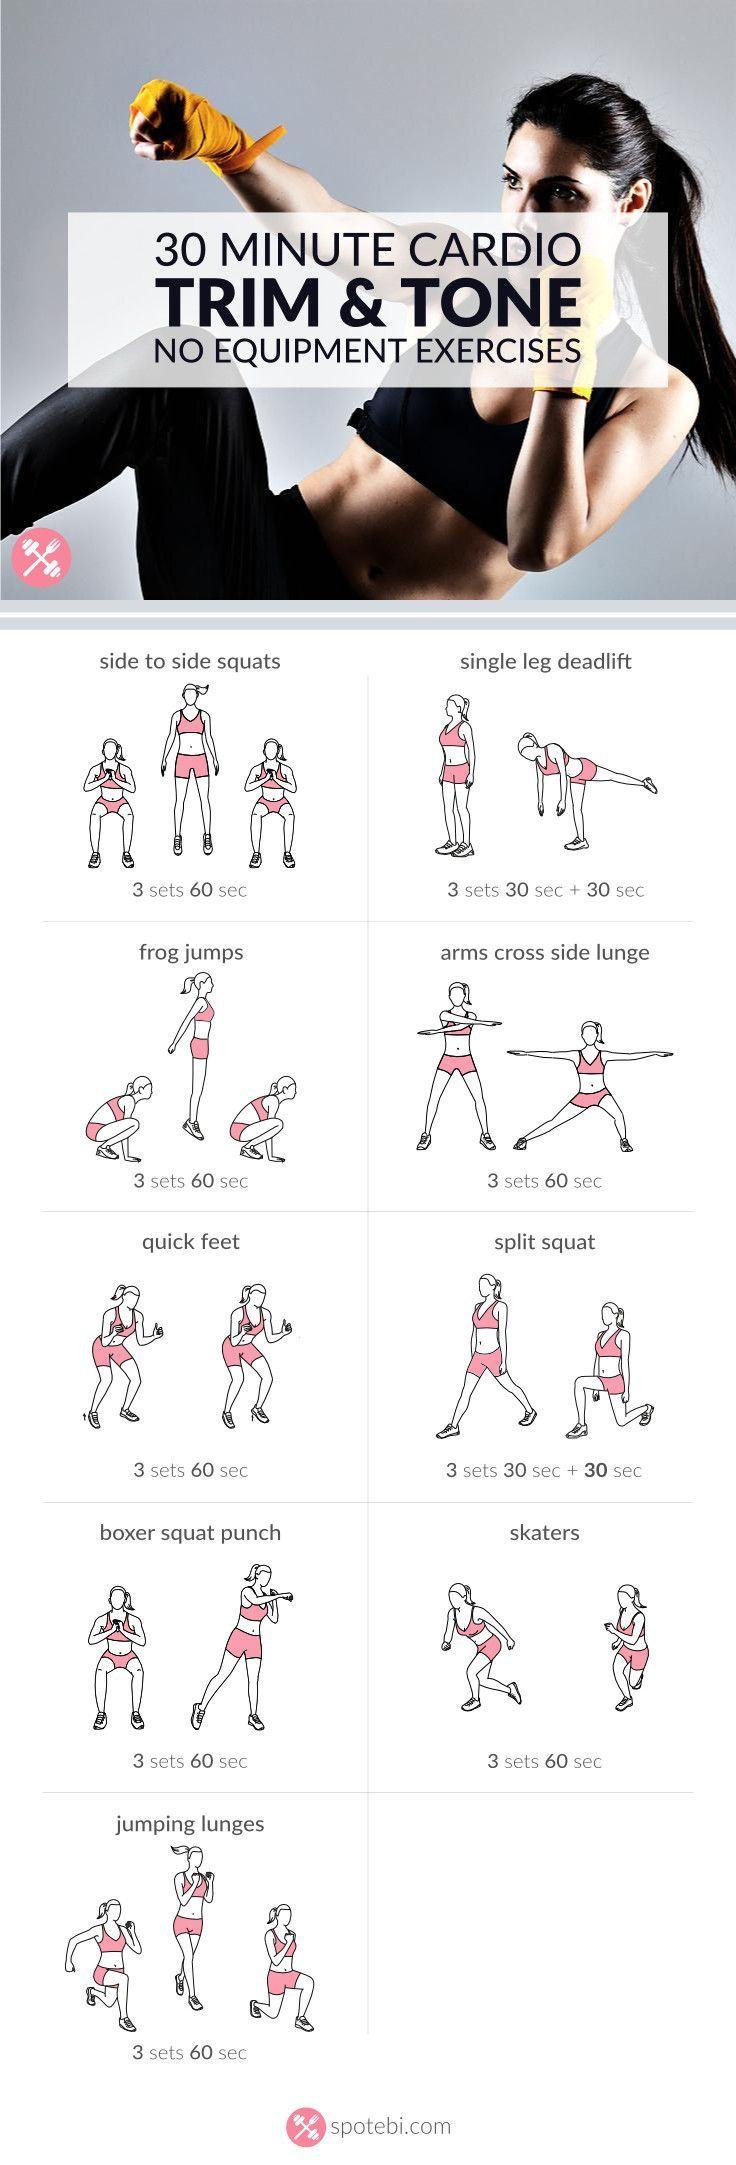 Cardio arm exercises